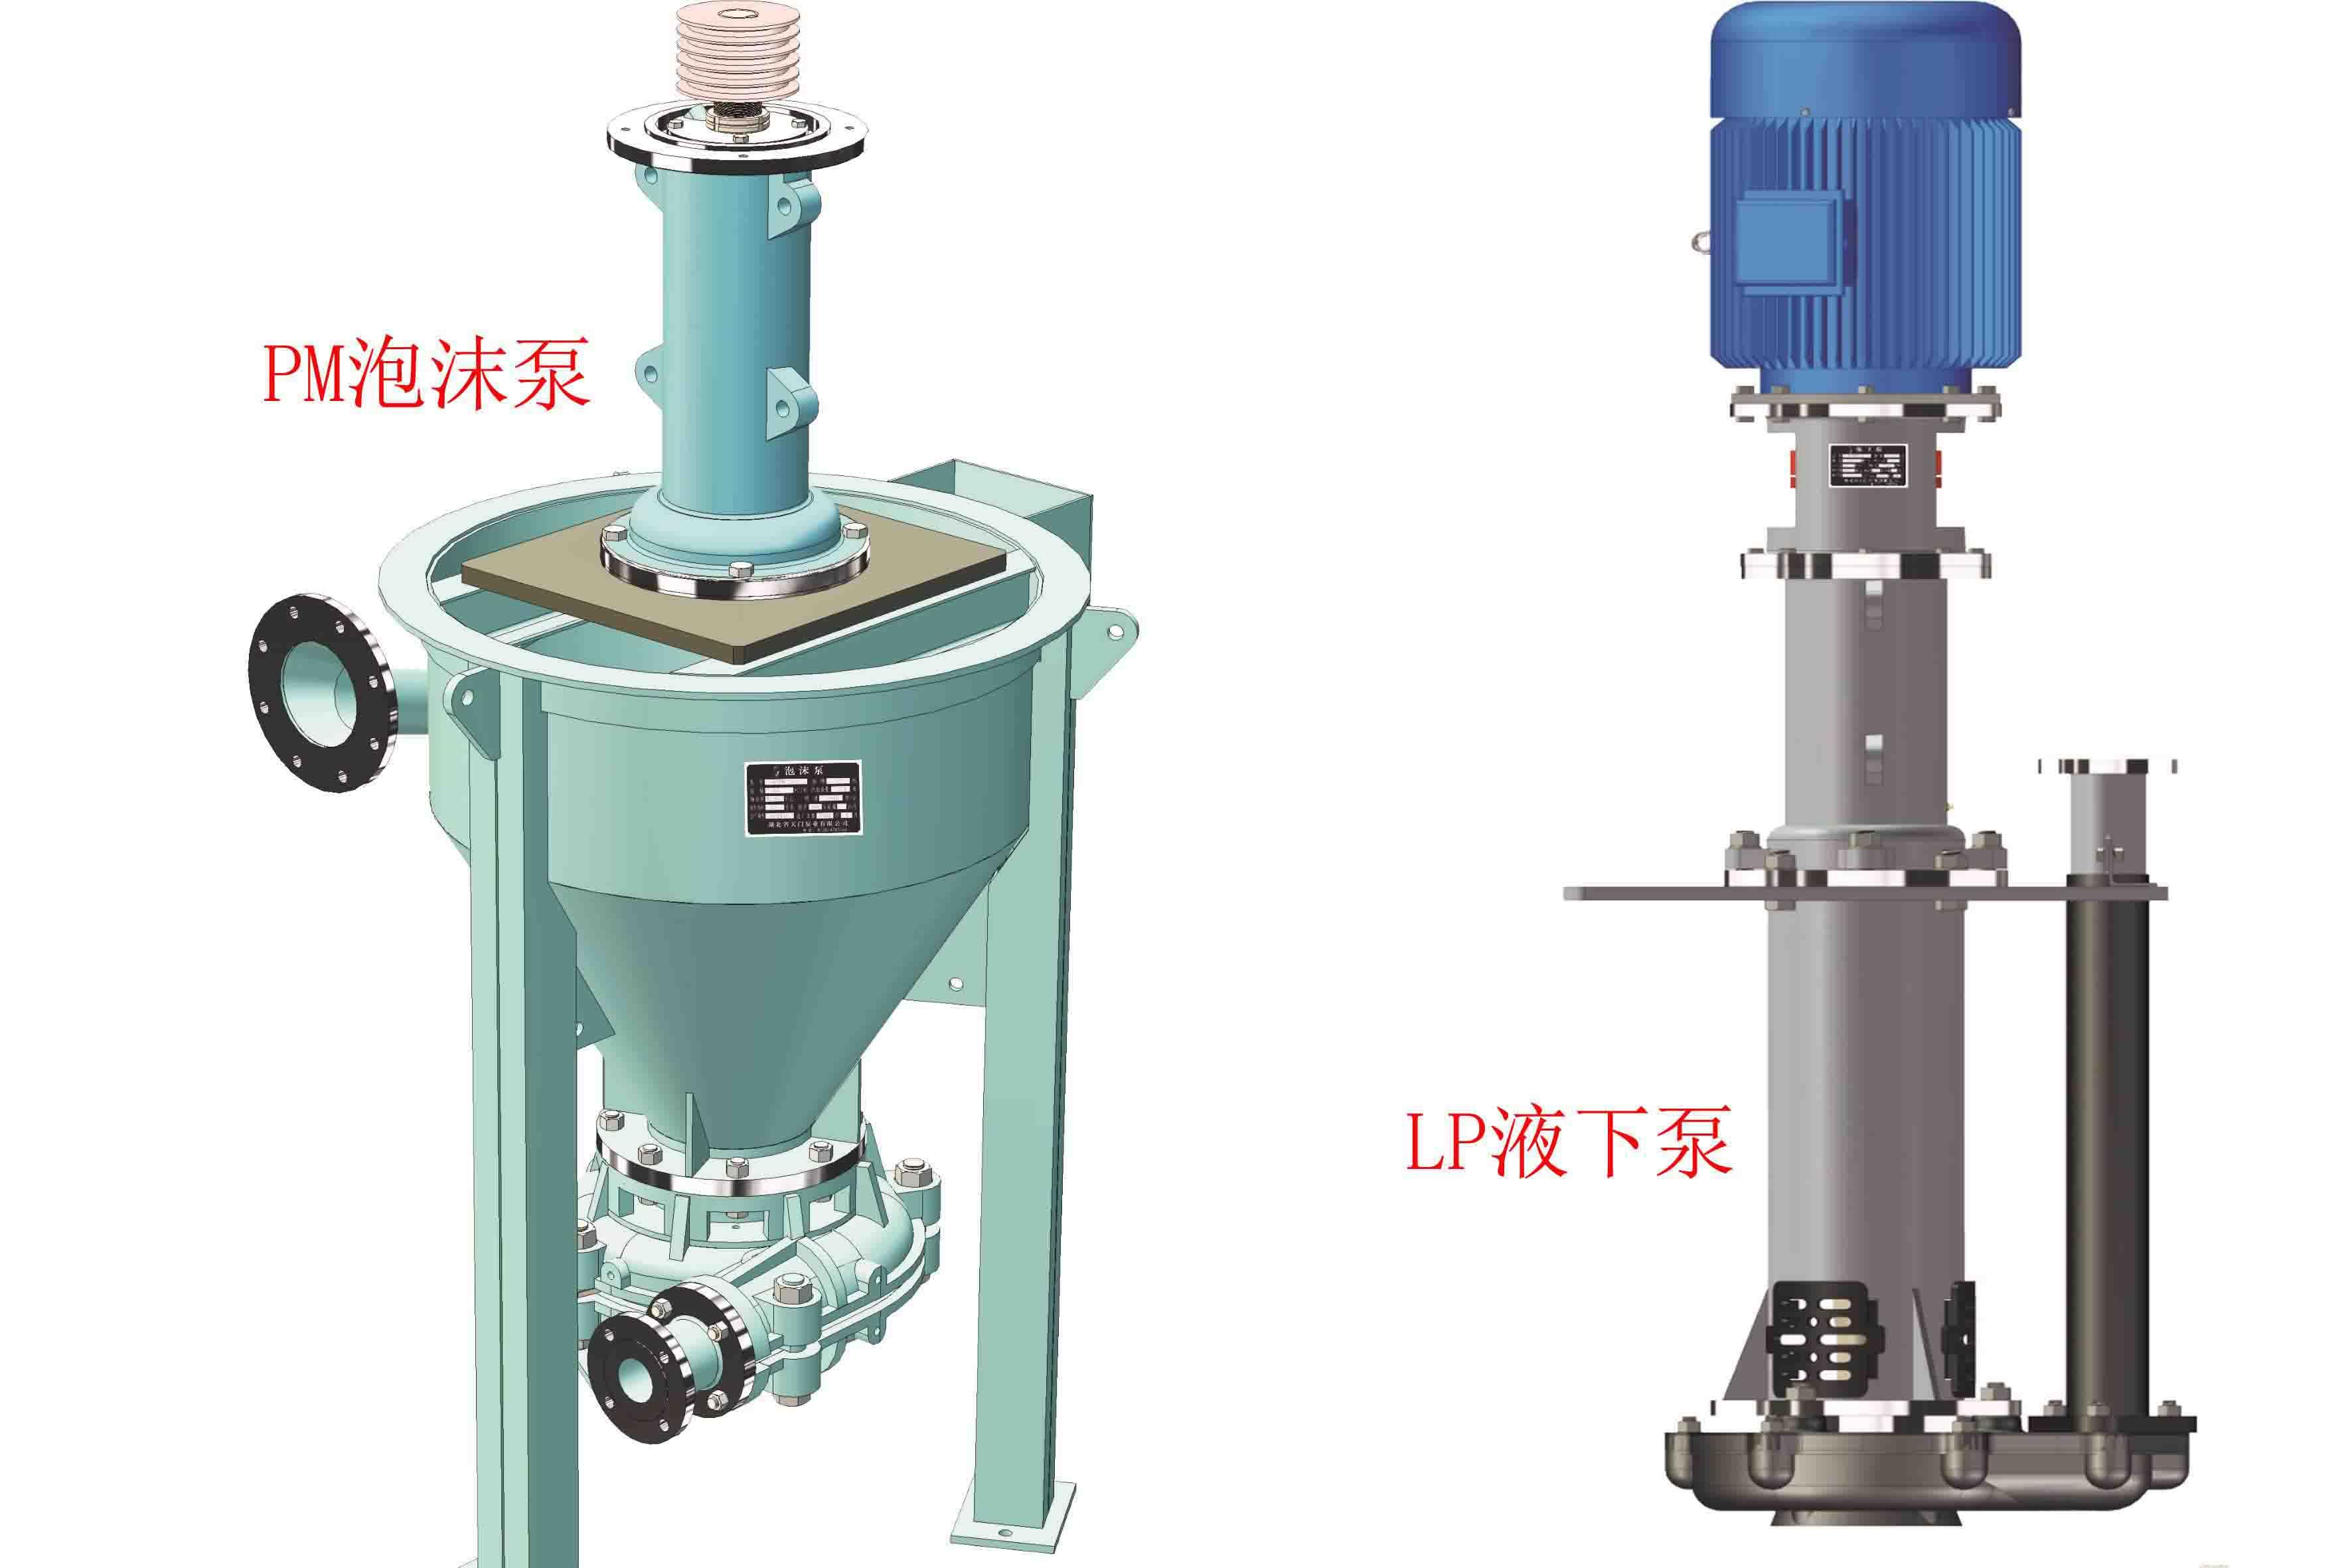 PM系列泡沫泵